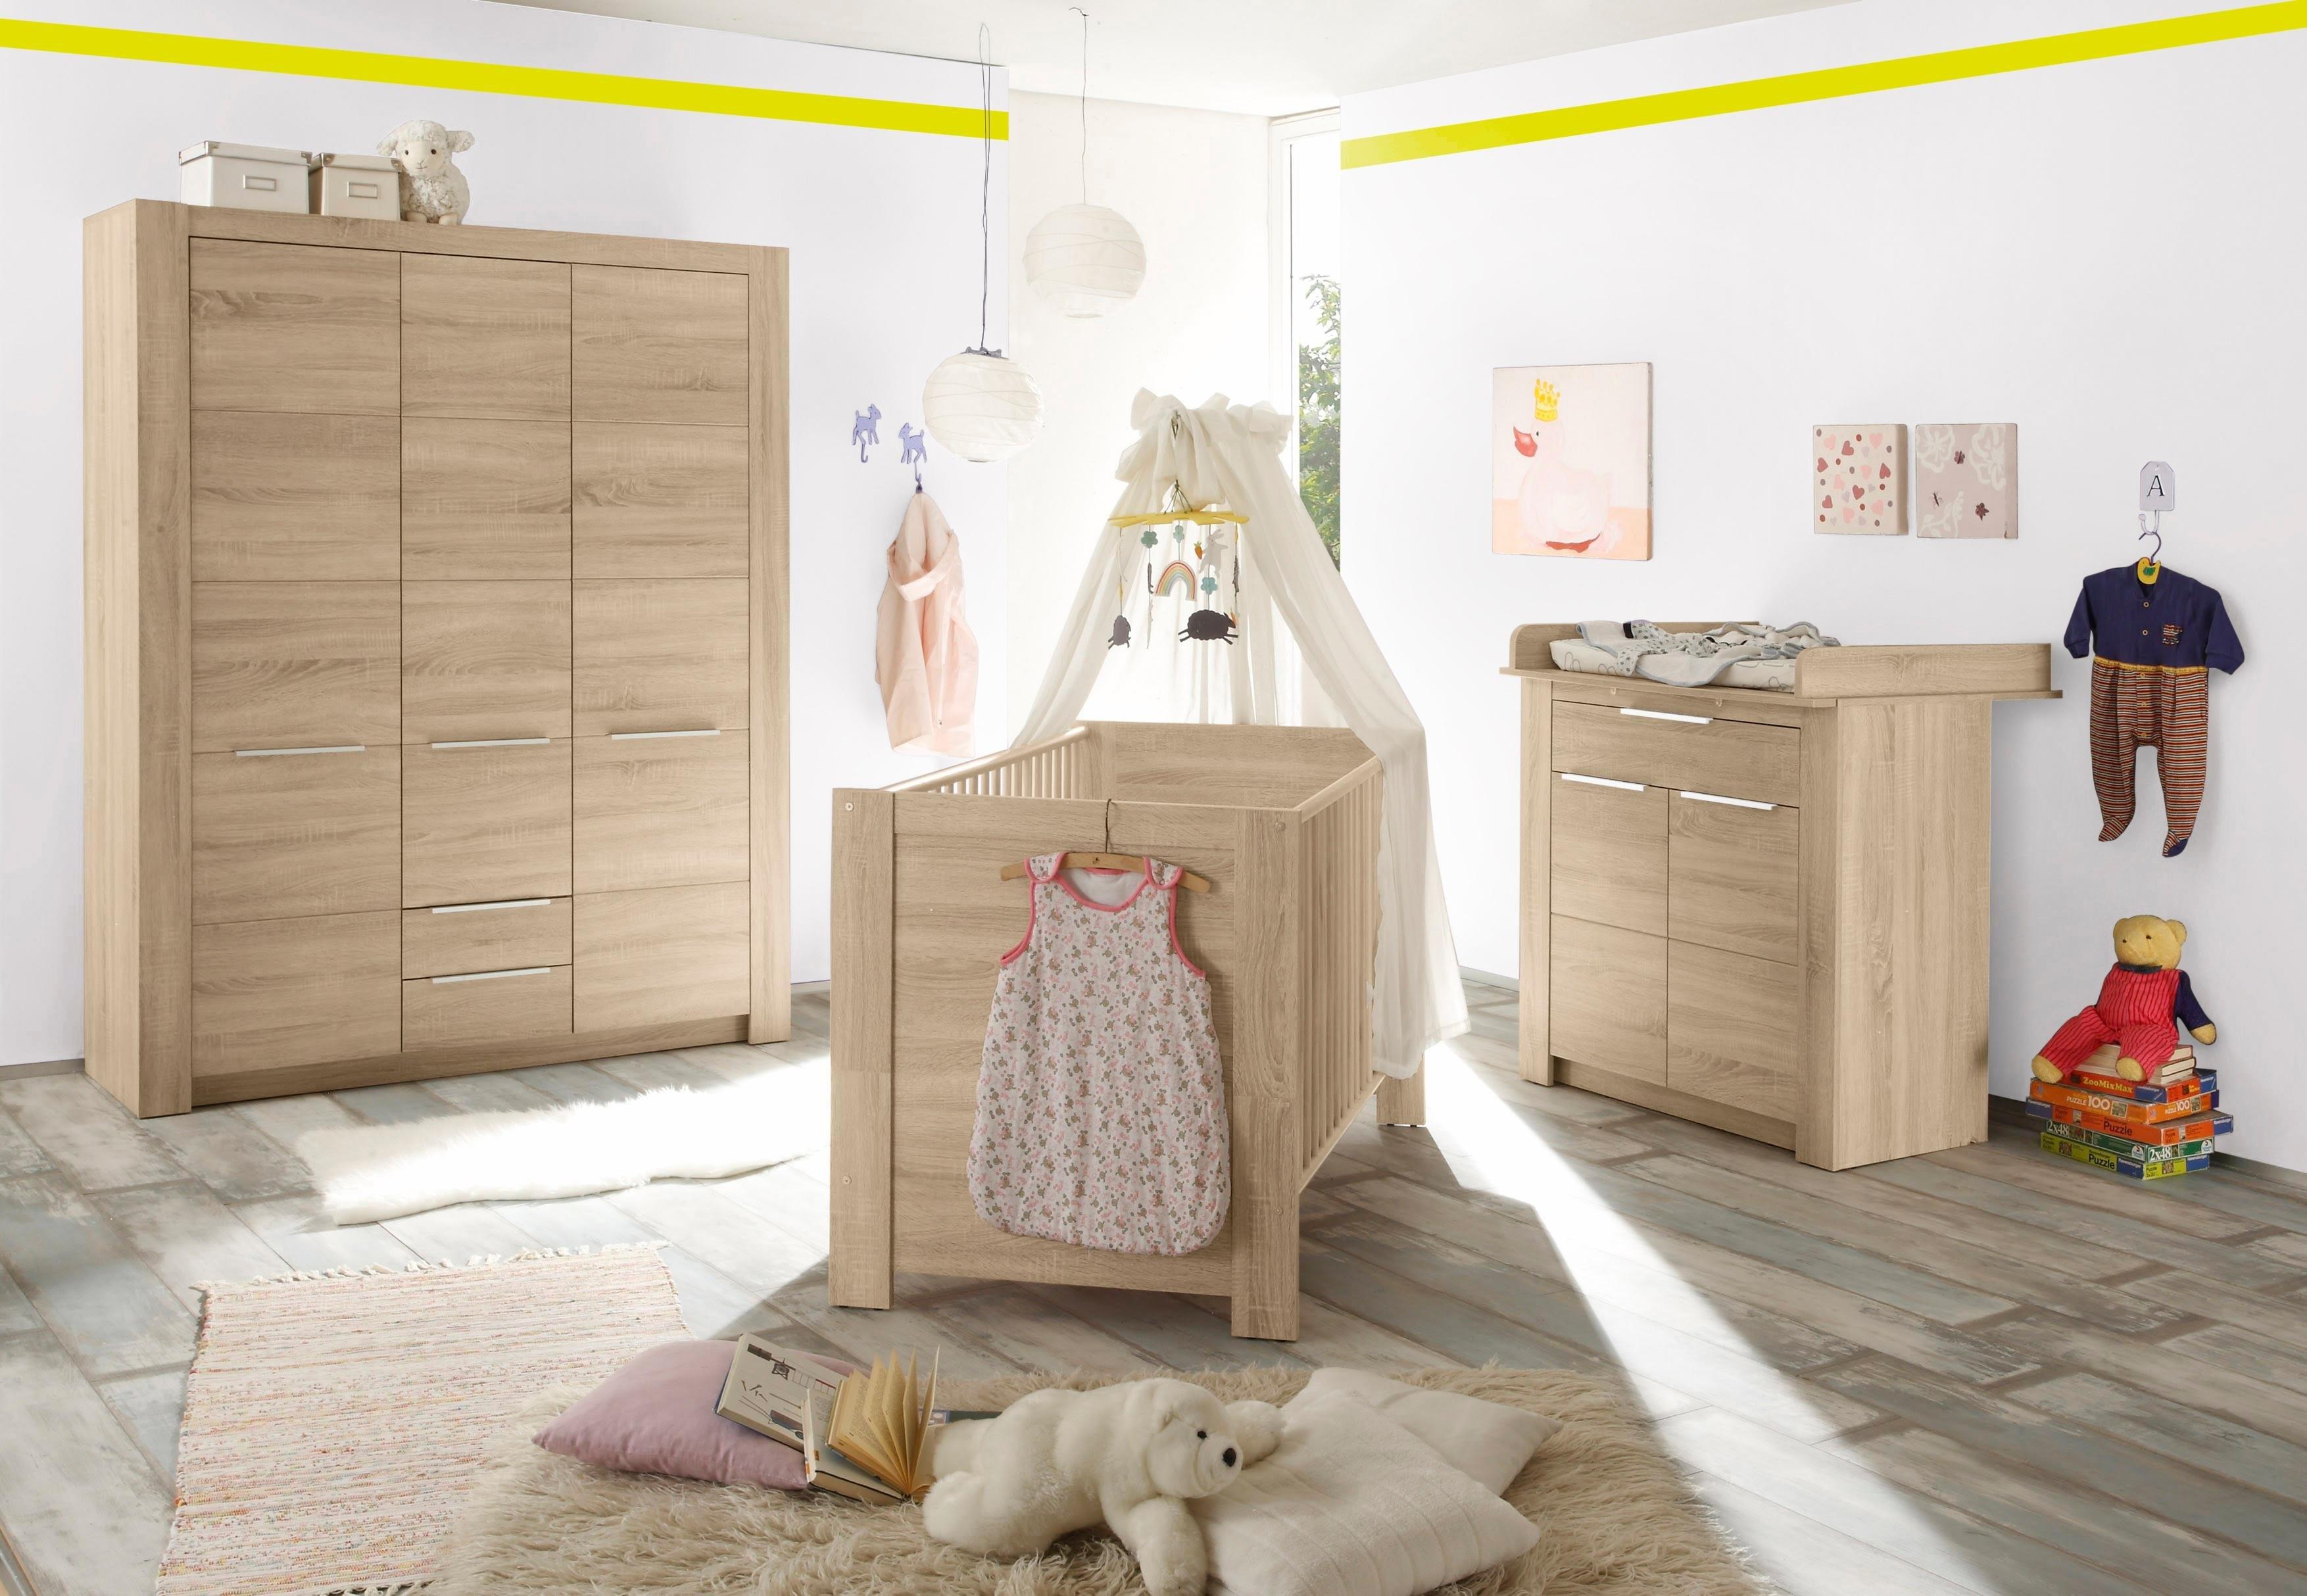 afbeeldingsbron slaapkamer hamburg babyledikantje babycommode brede garderobekast 3 dlg imitatie eiken